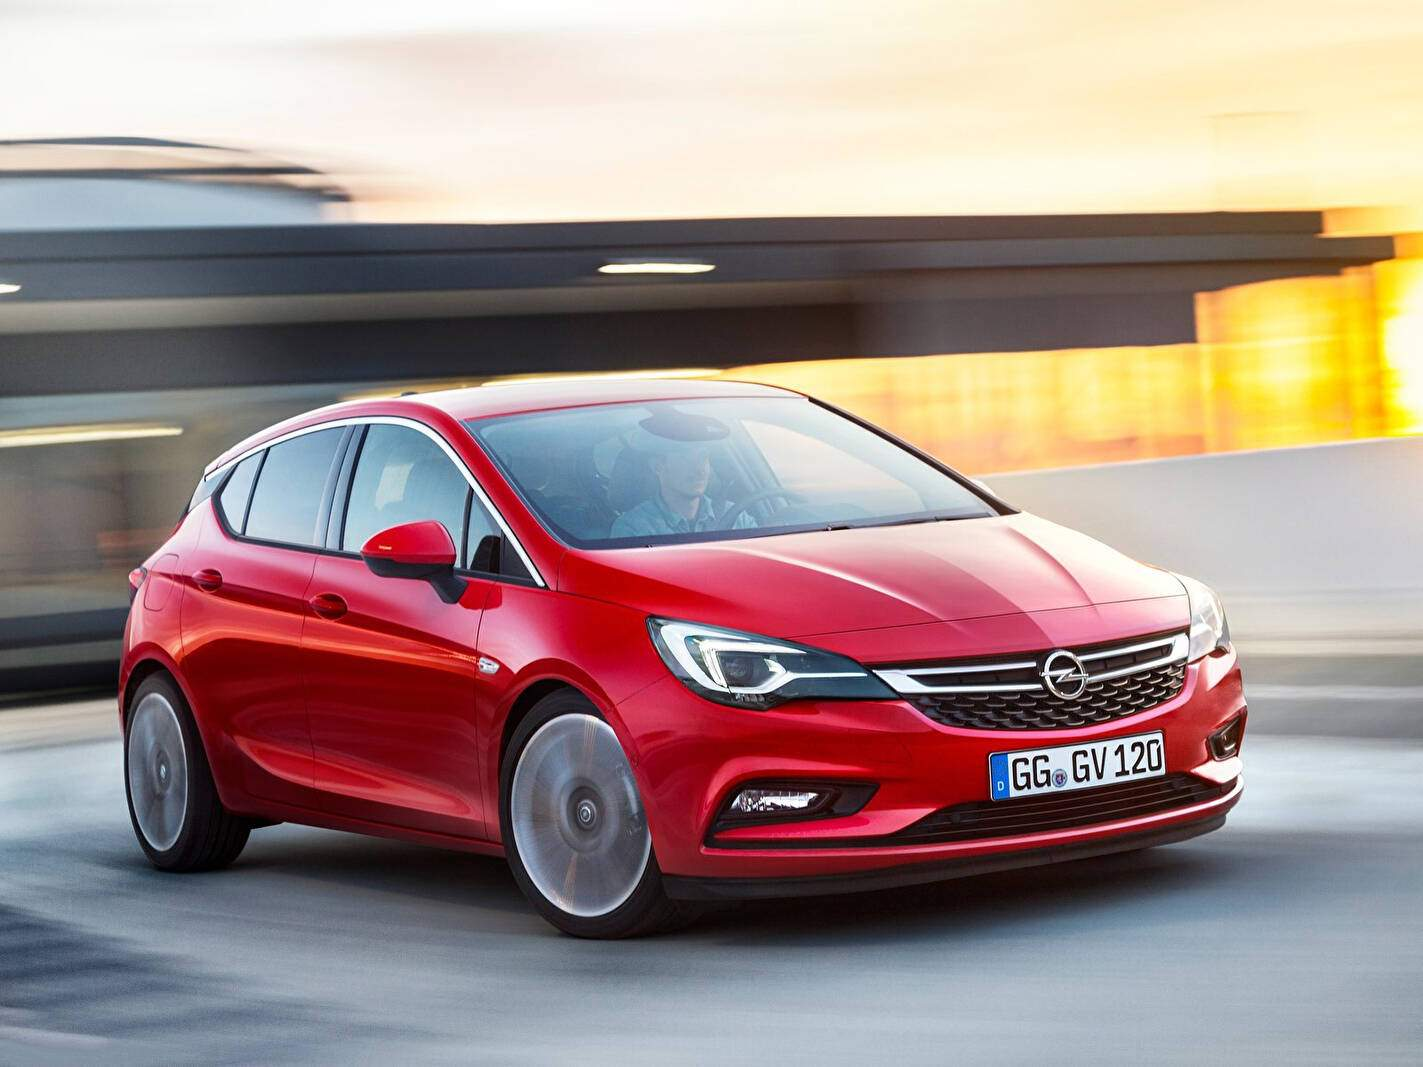 Opel Astra V 1.6 Turbo 200 (K) (2015-2019),  ajouté par fox58